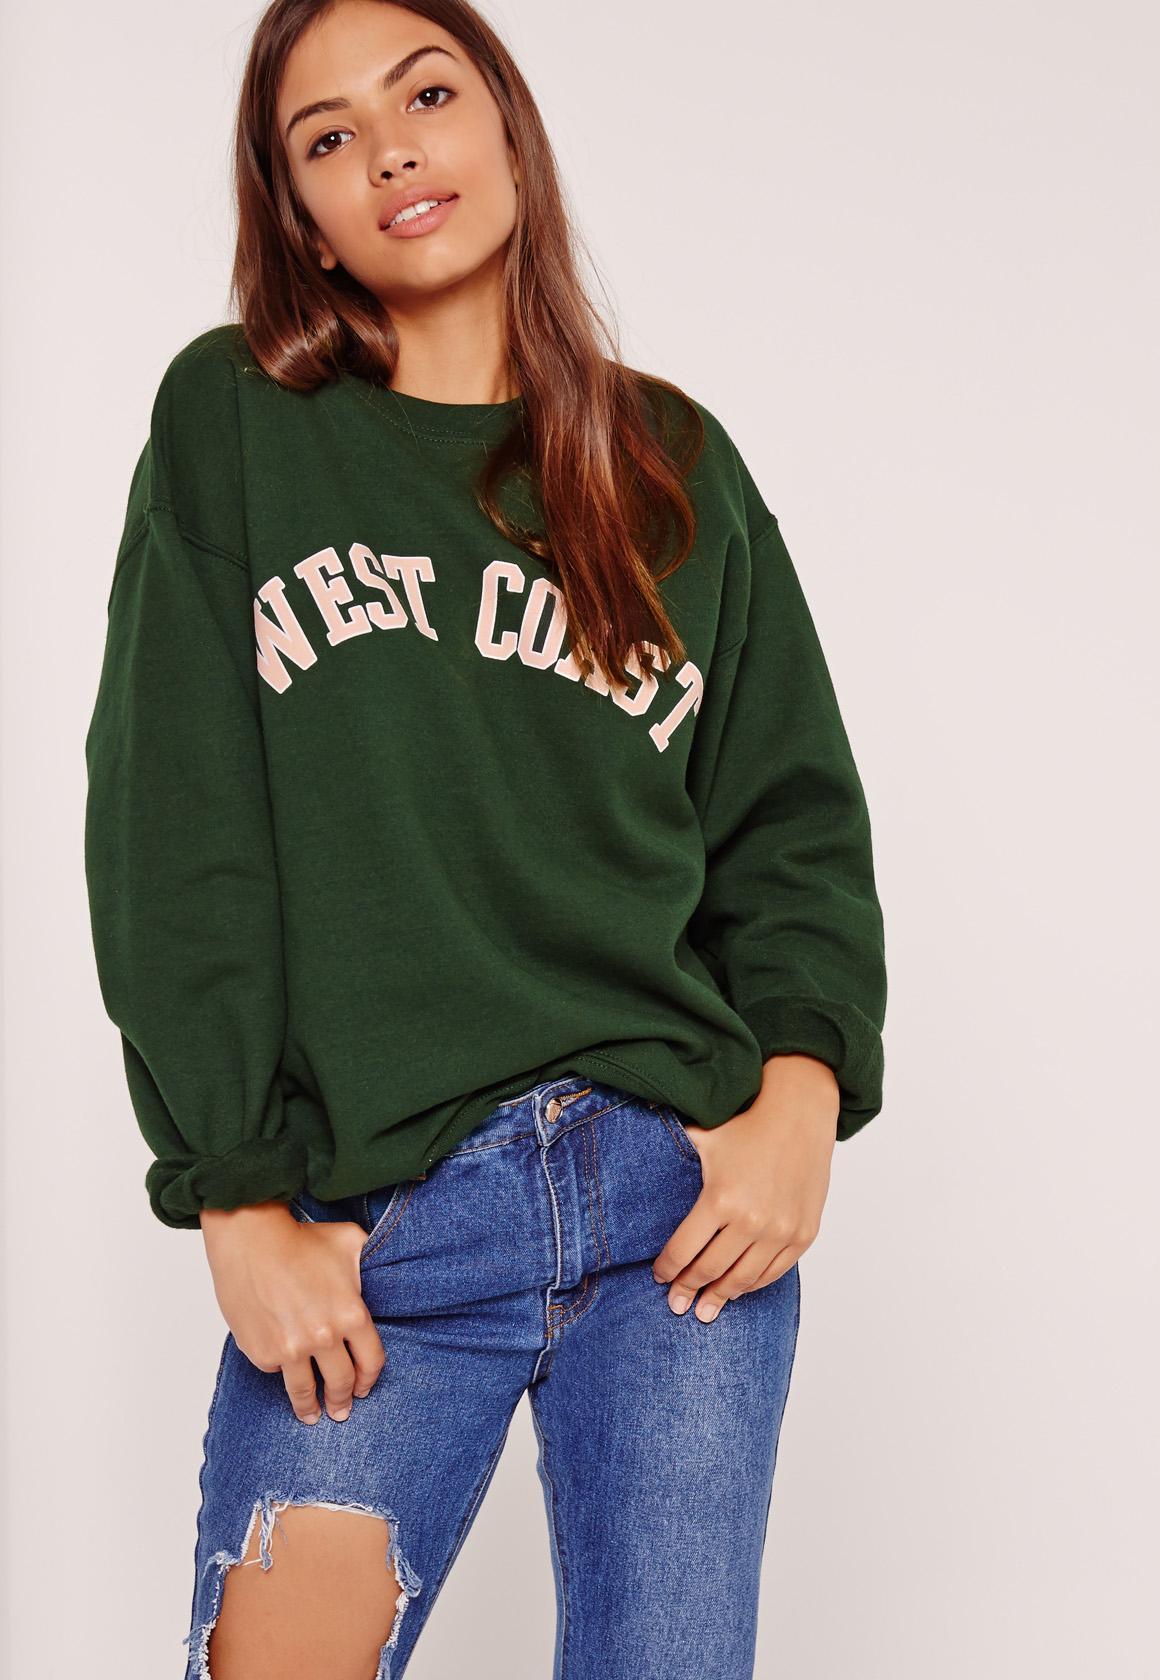 West Coast Slogan Sweatshirt Green | Missguided